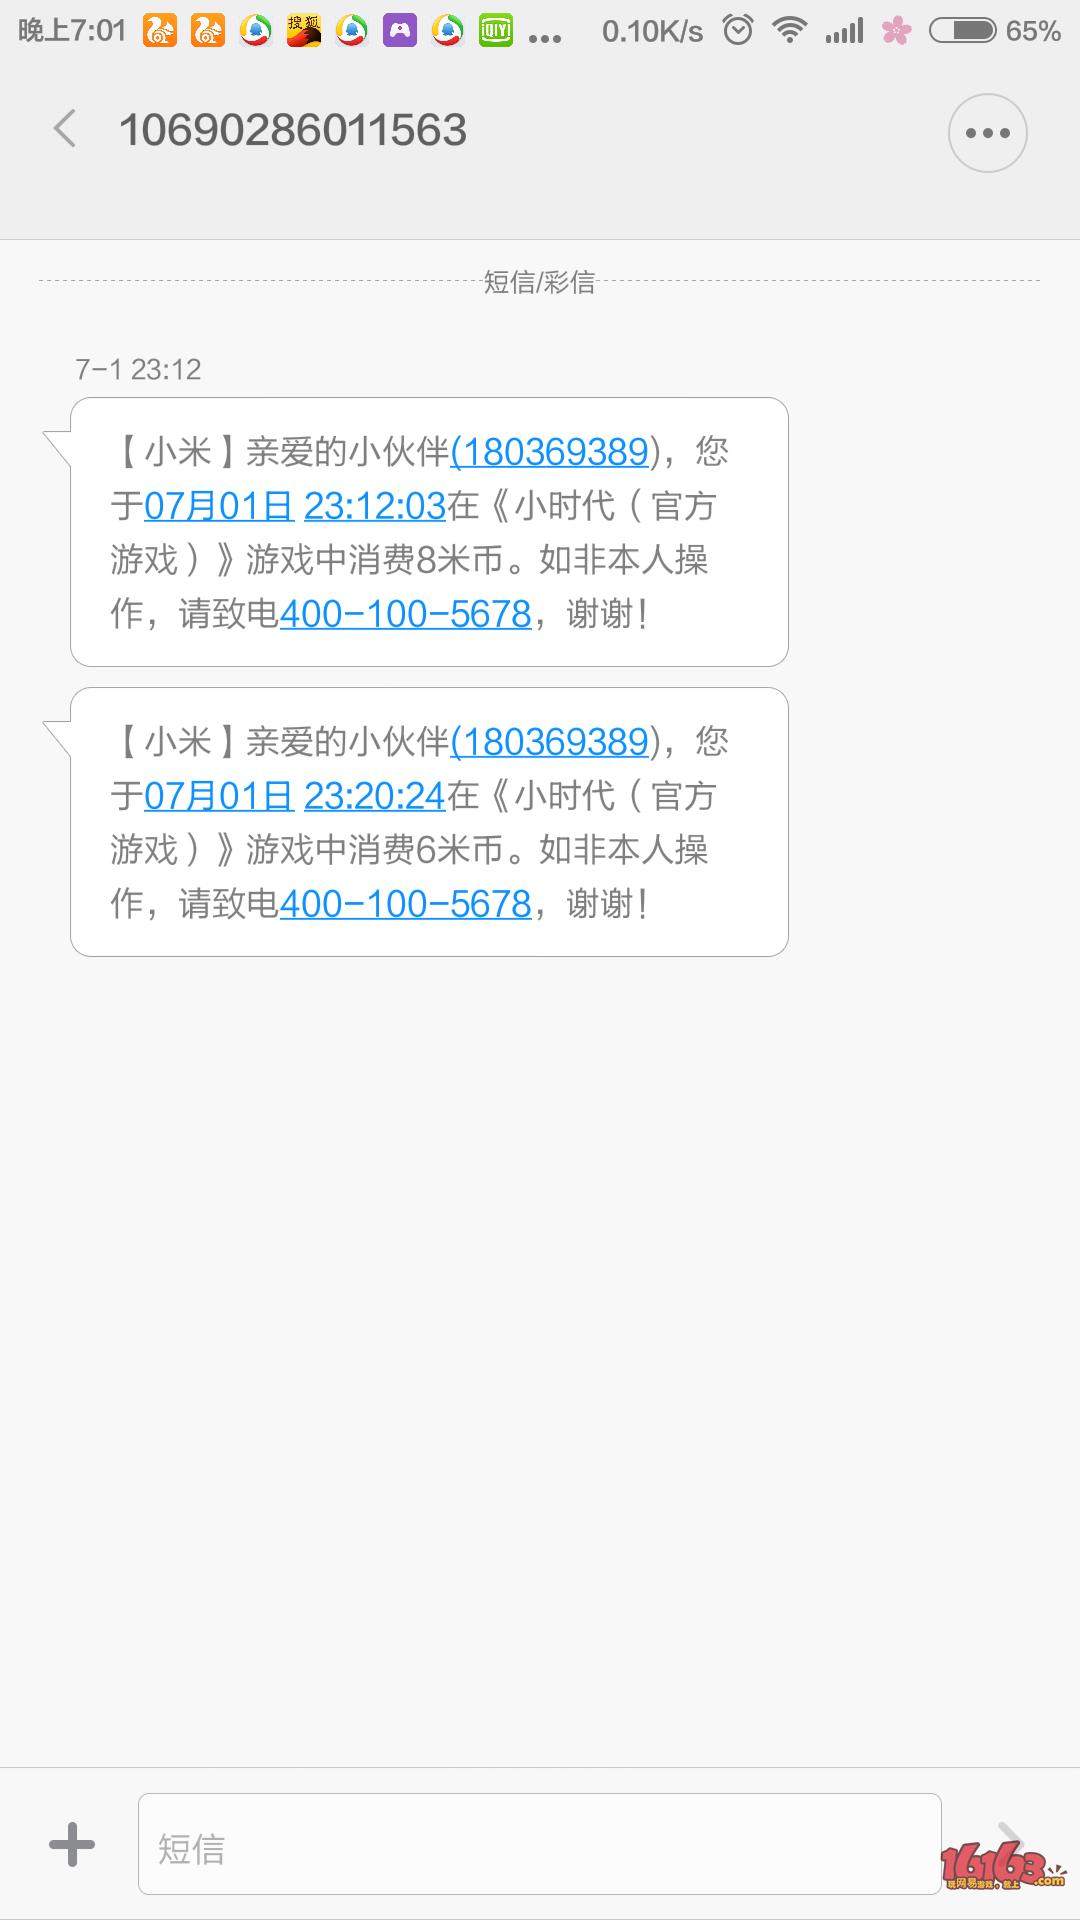 Screenshot_2015-07-02-19-01-21.png